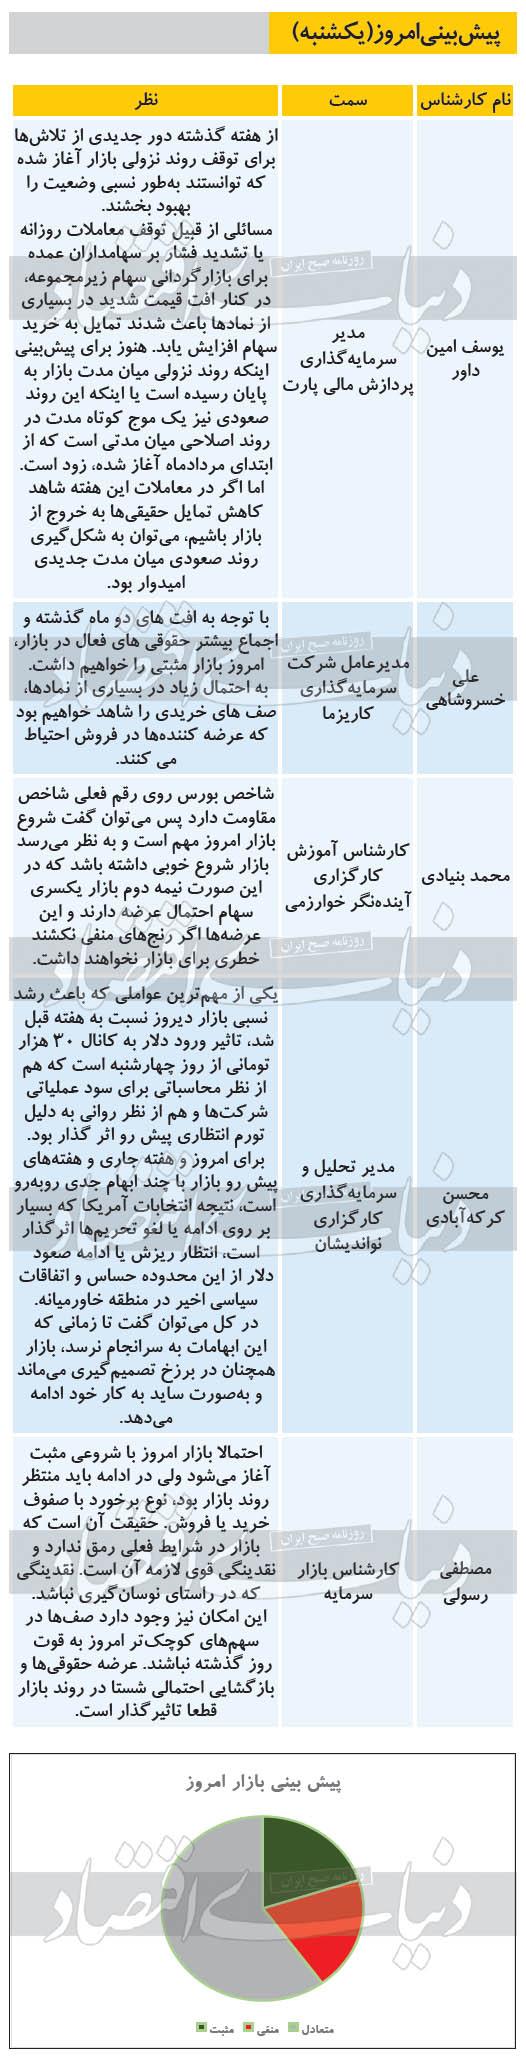 پیشبینی بورس 13 مهر